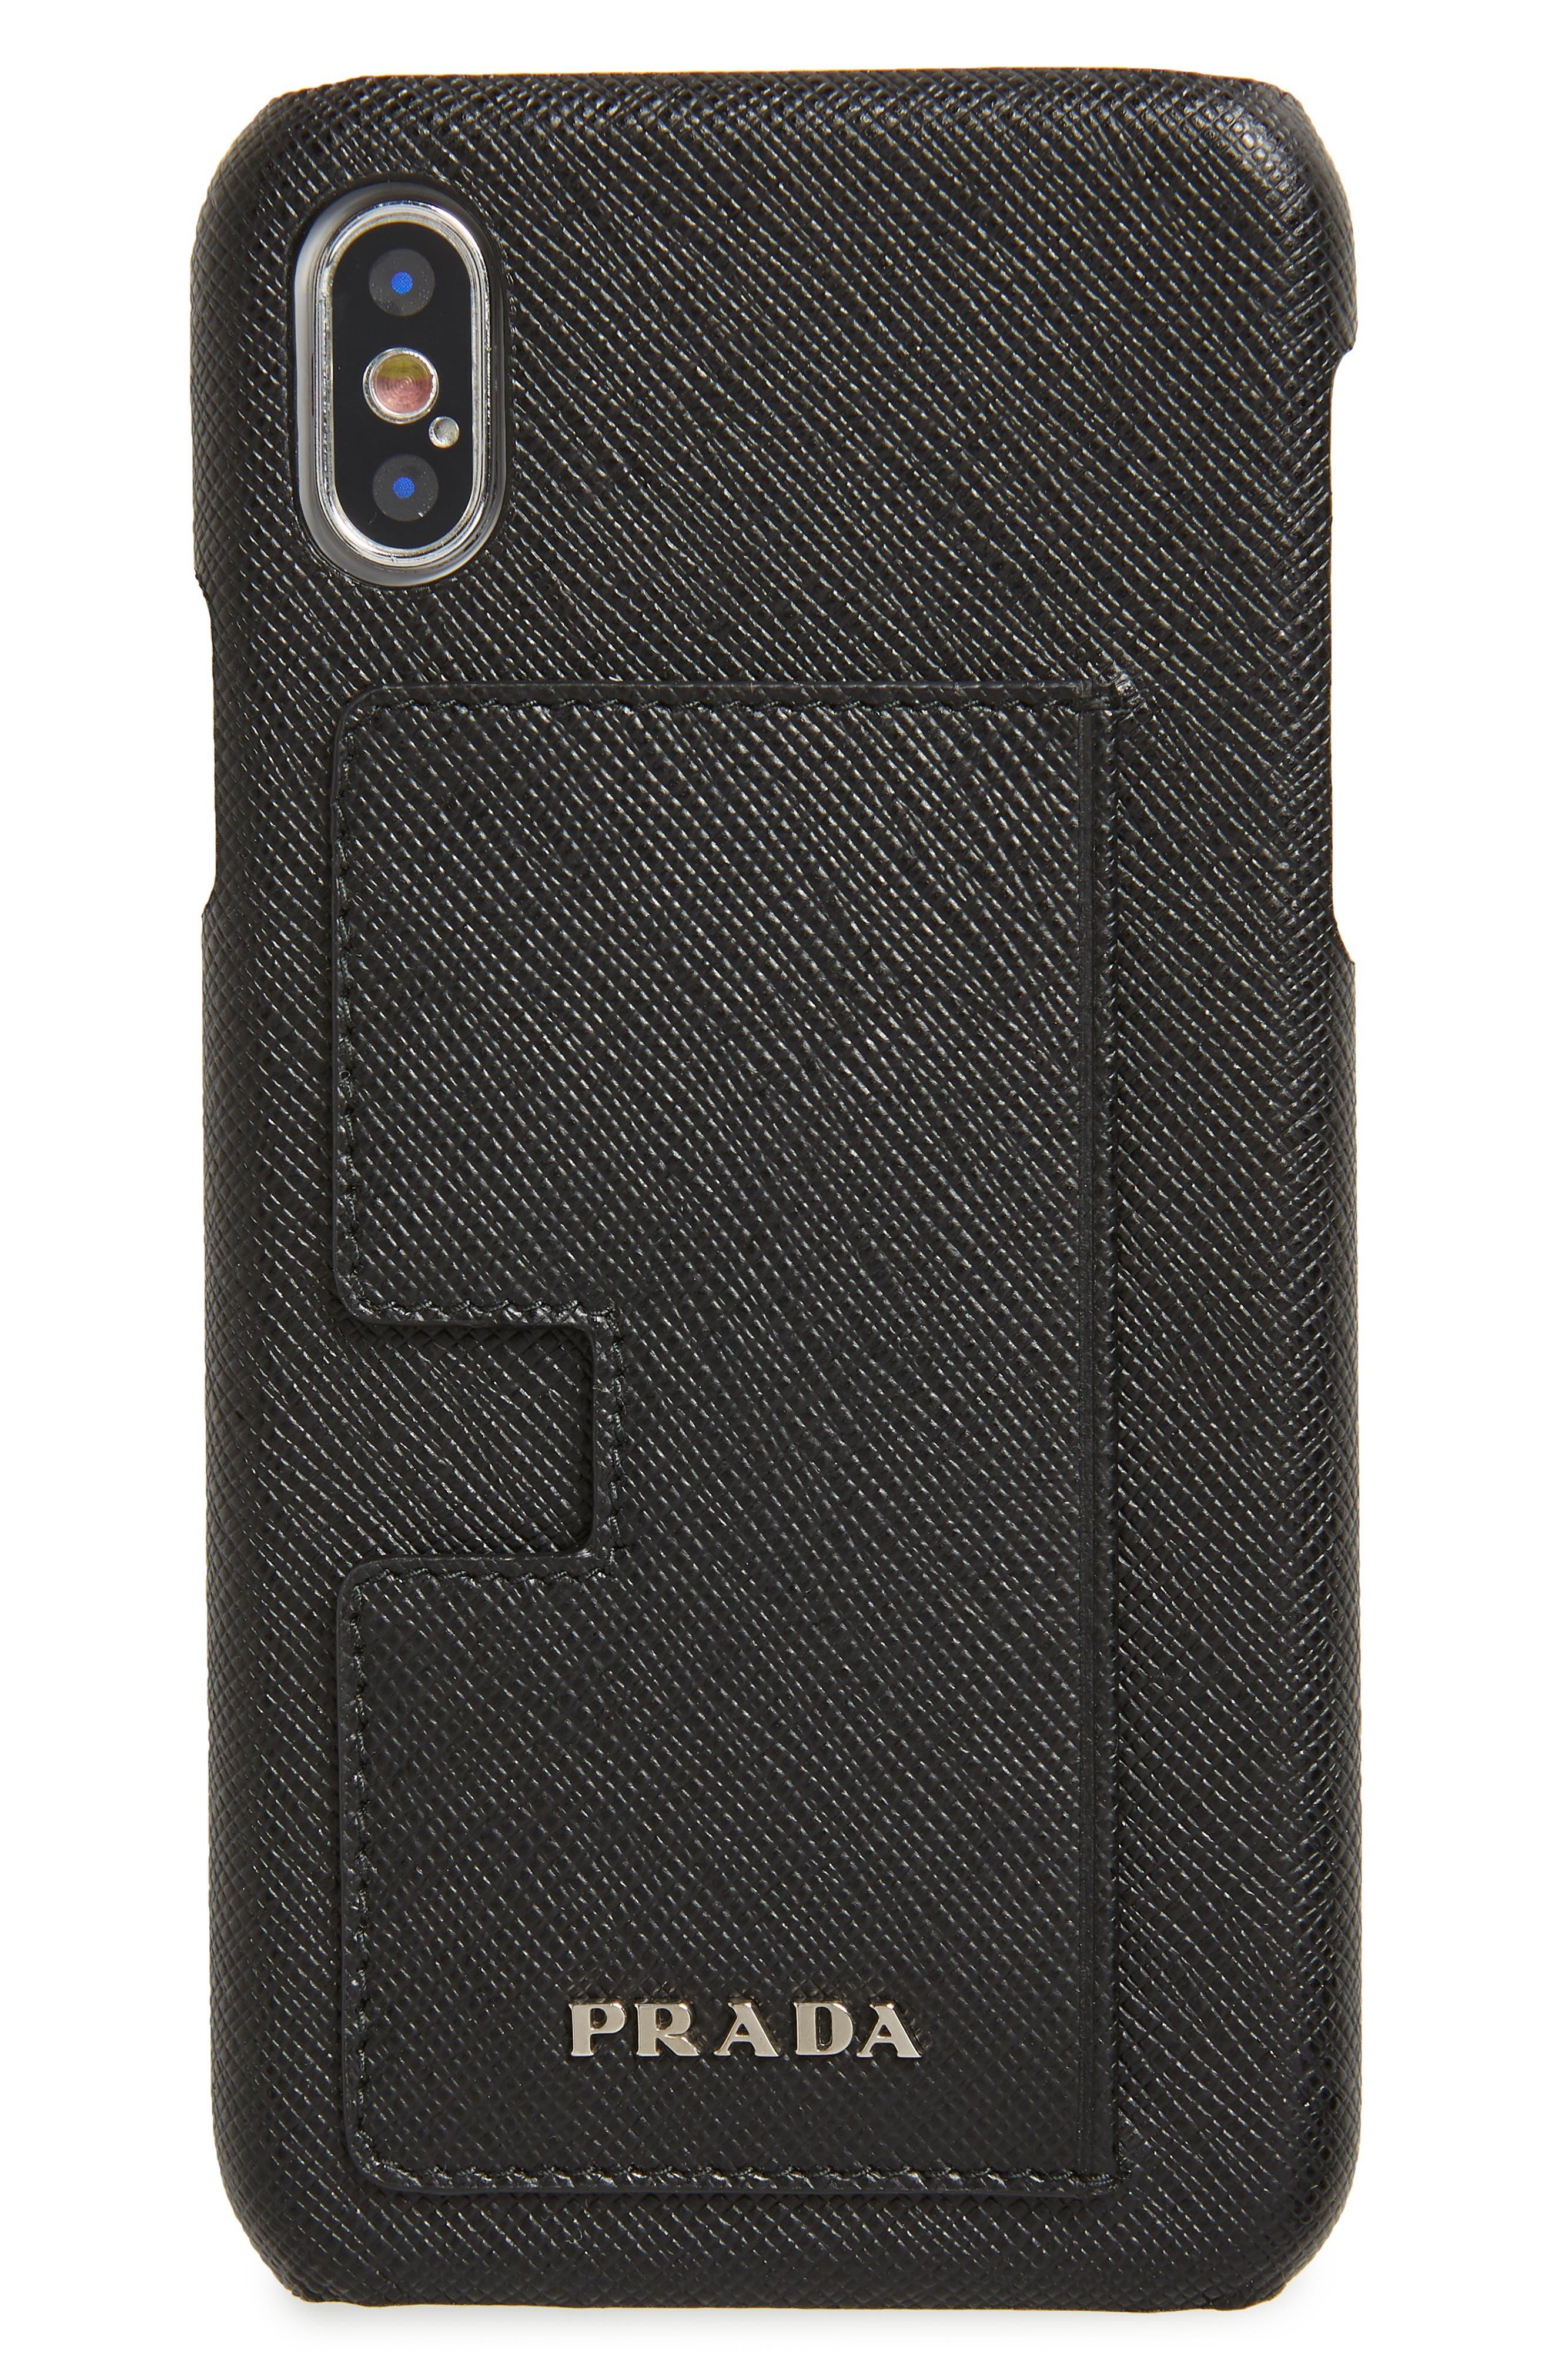 PRADA,                             Saffiano Leather iPhone X & Xs Case,                             Main thumbnail 1, color,                             001